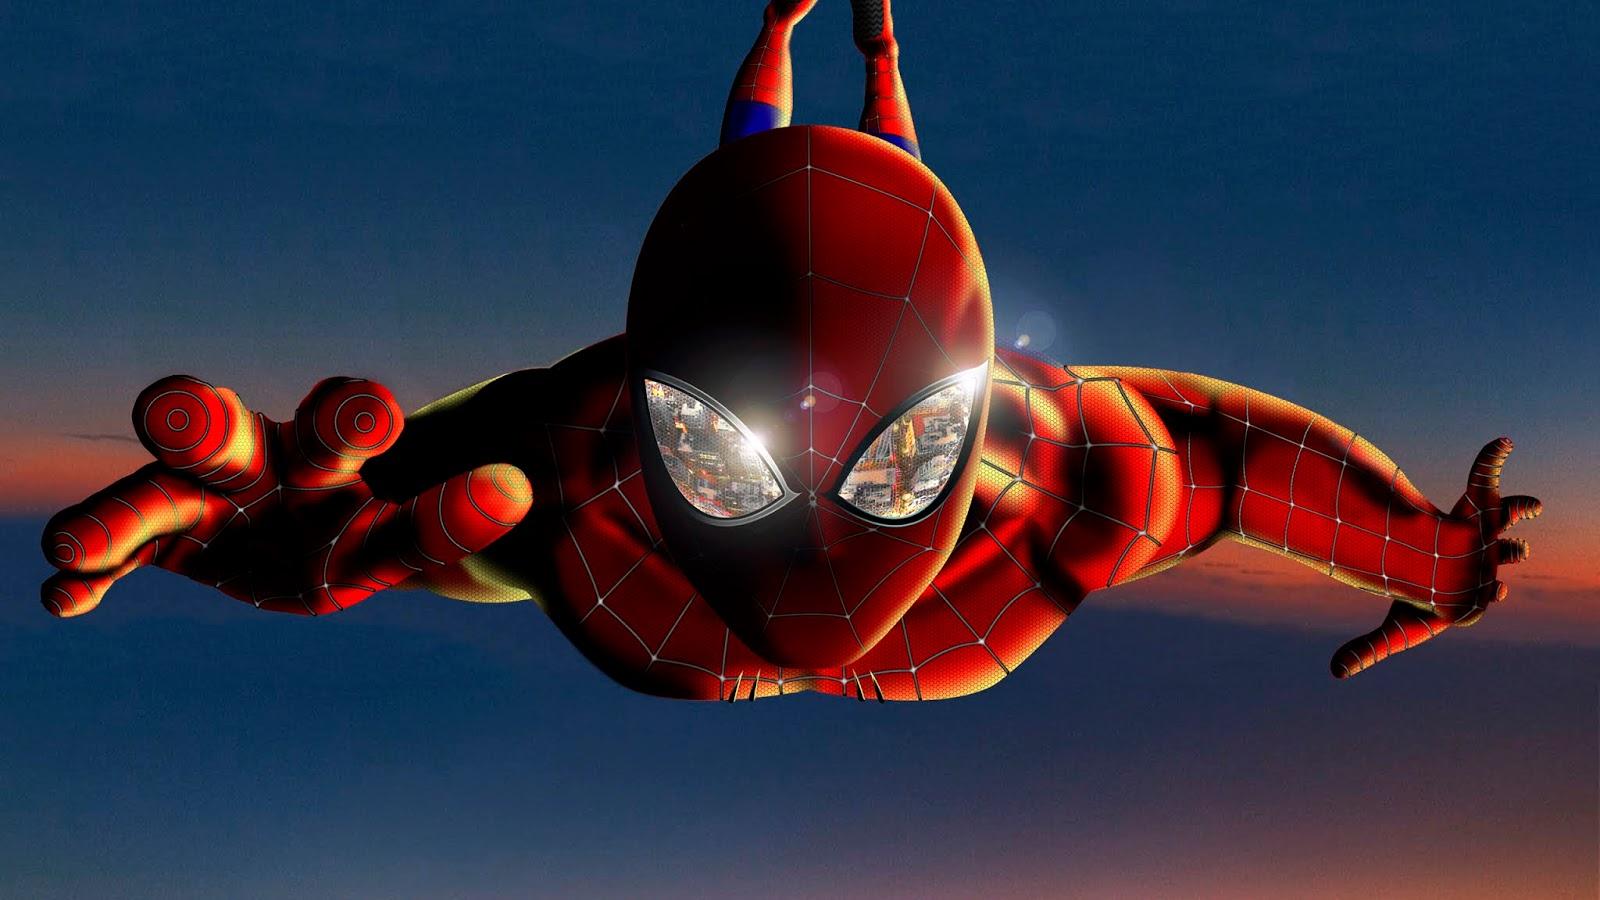 Spider-man Wallpaper 4k, Spider Man Wallpaper 4k Iphone, - Full Hd Wallpaper 4k , HD Wallpaper & Backgrounds